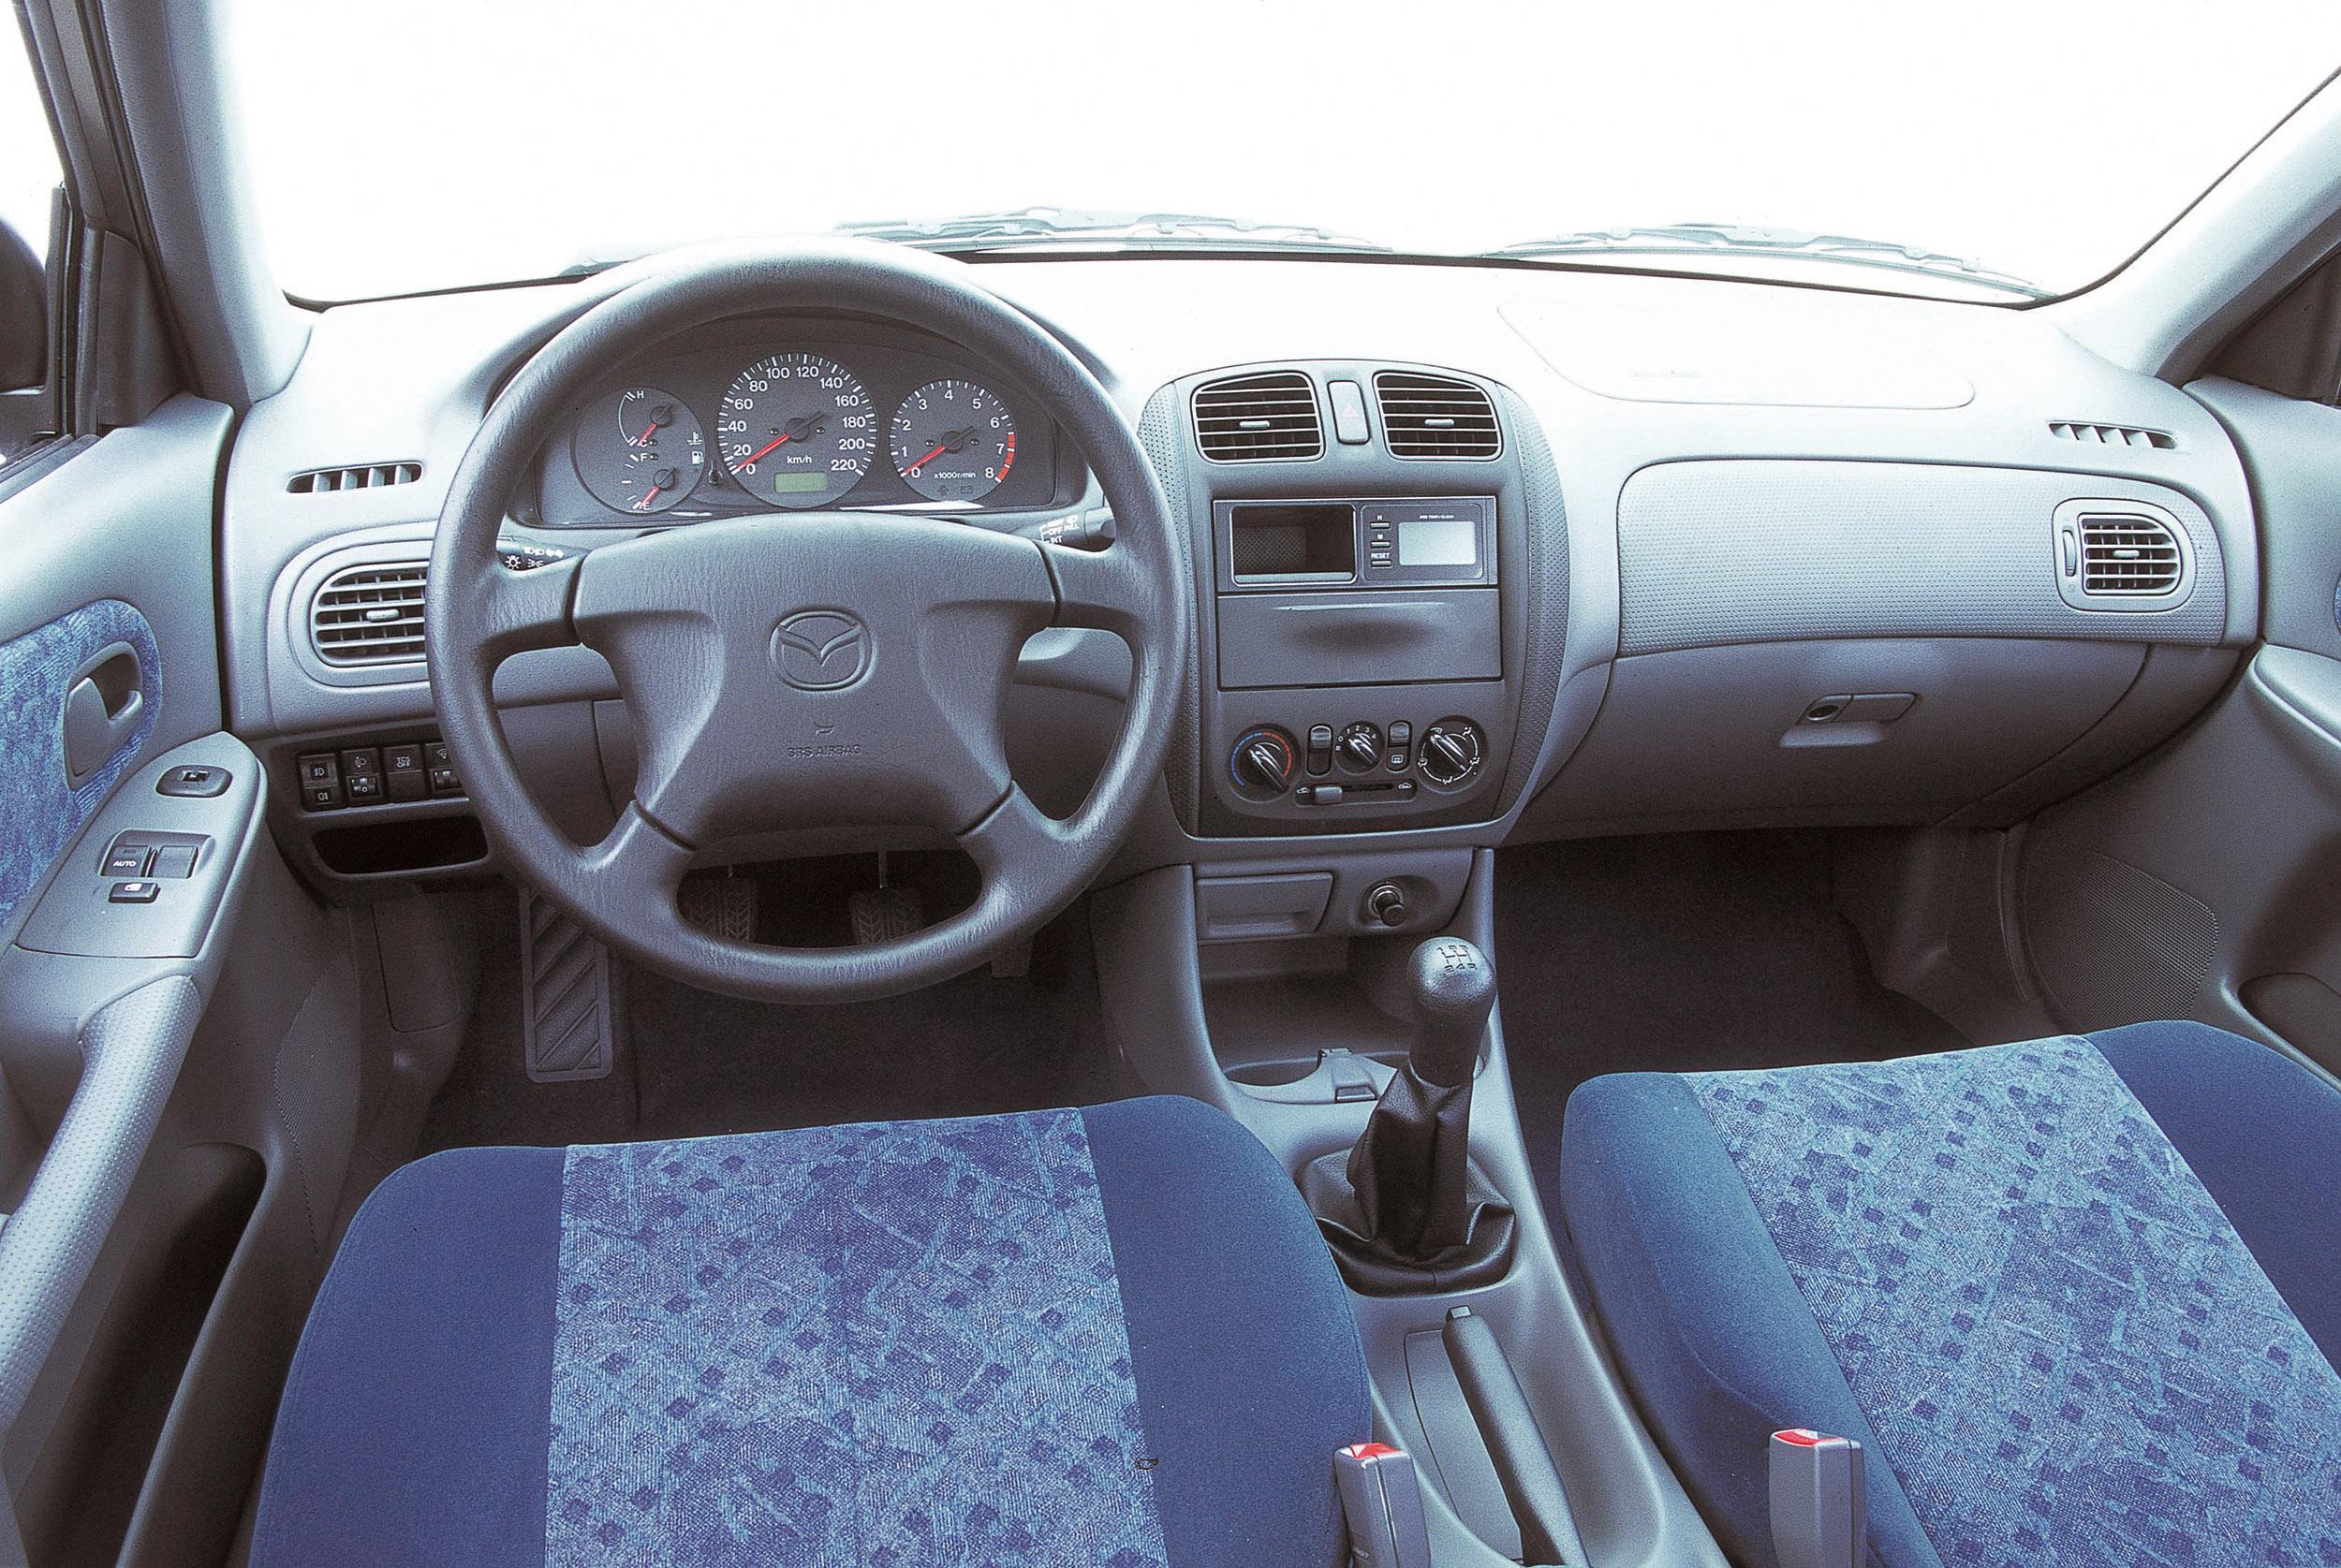 https://www.automobilesreview.com/img/2000-mazda-323f/2000-mazda-323f-12.jpg